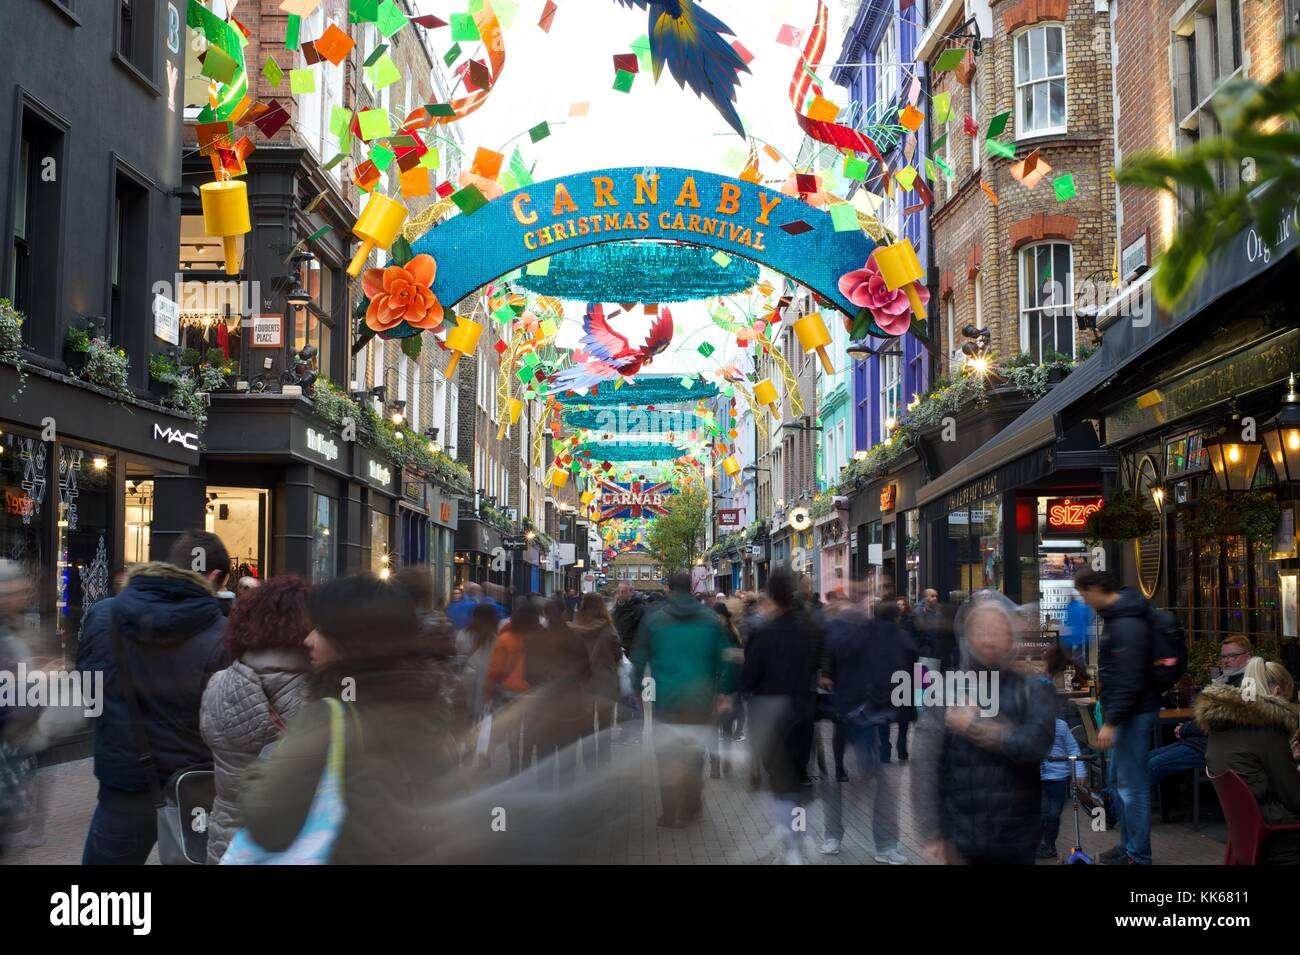 Carnaby Street - Stock Image